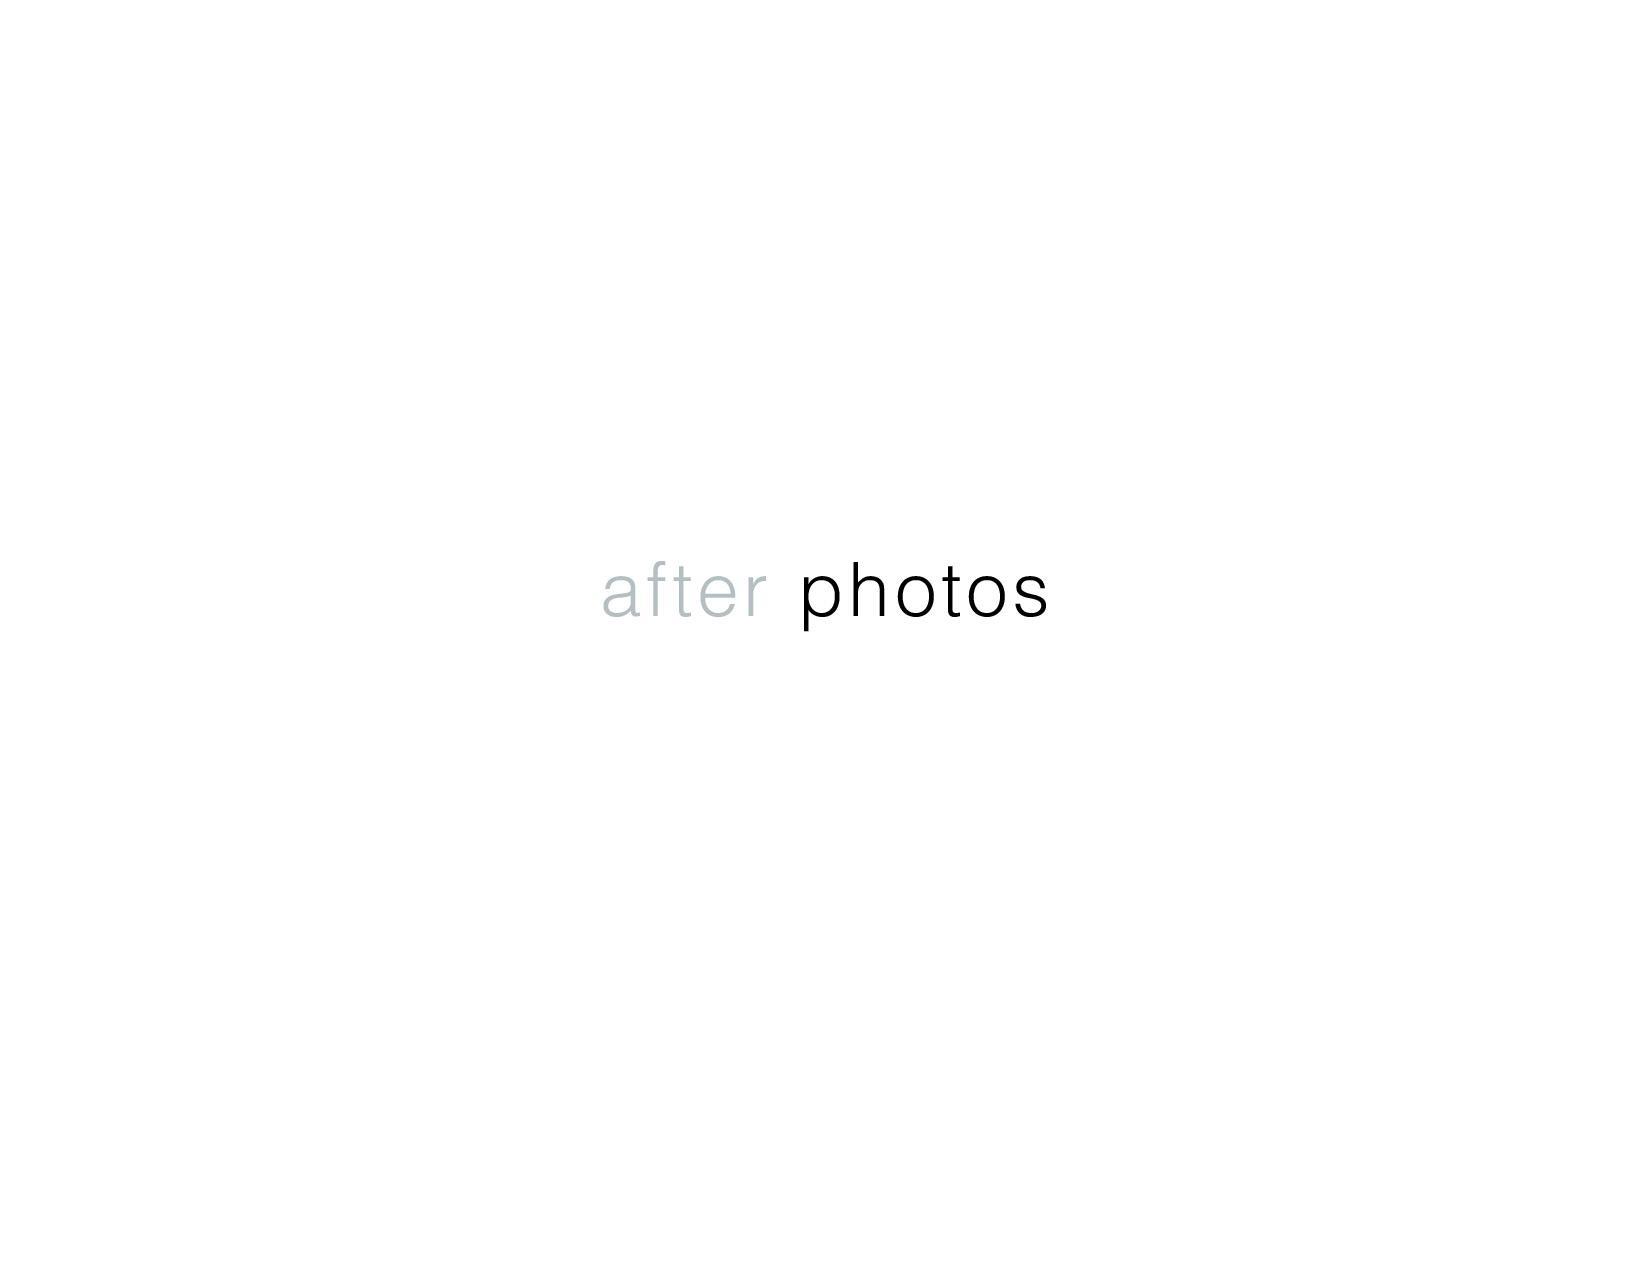 after Photos Label.jpg